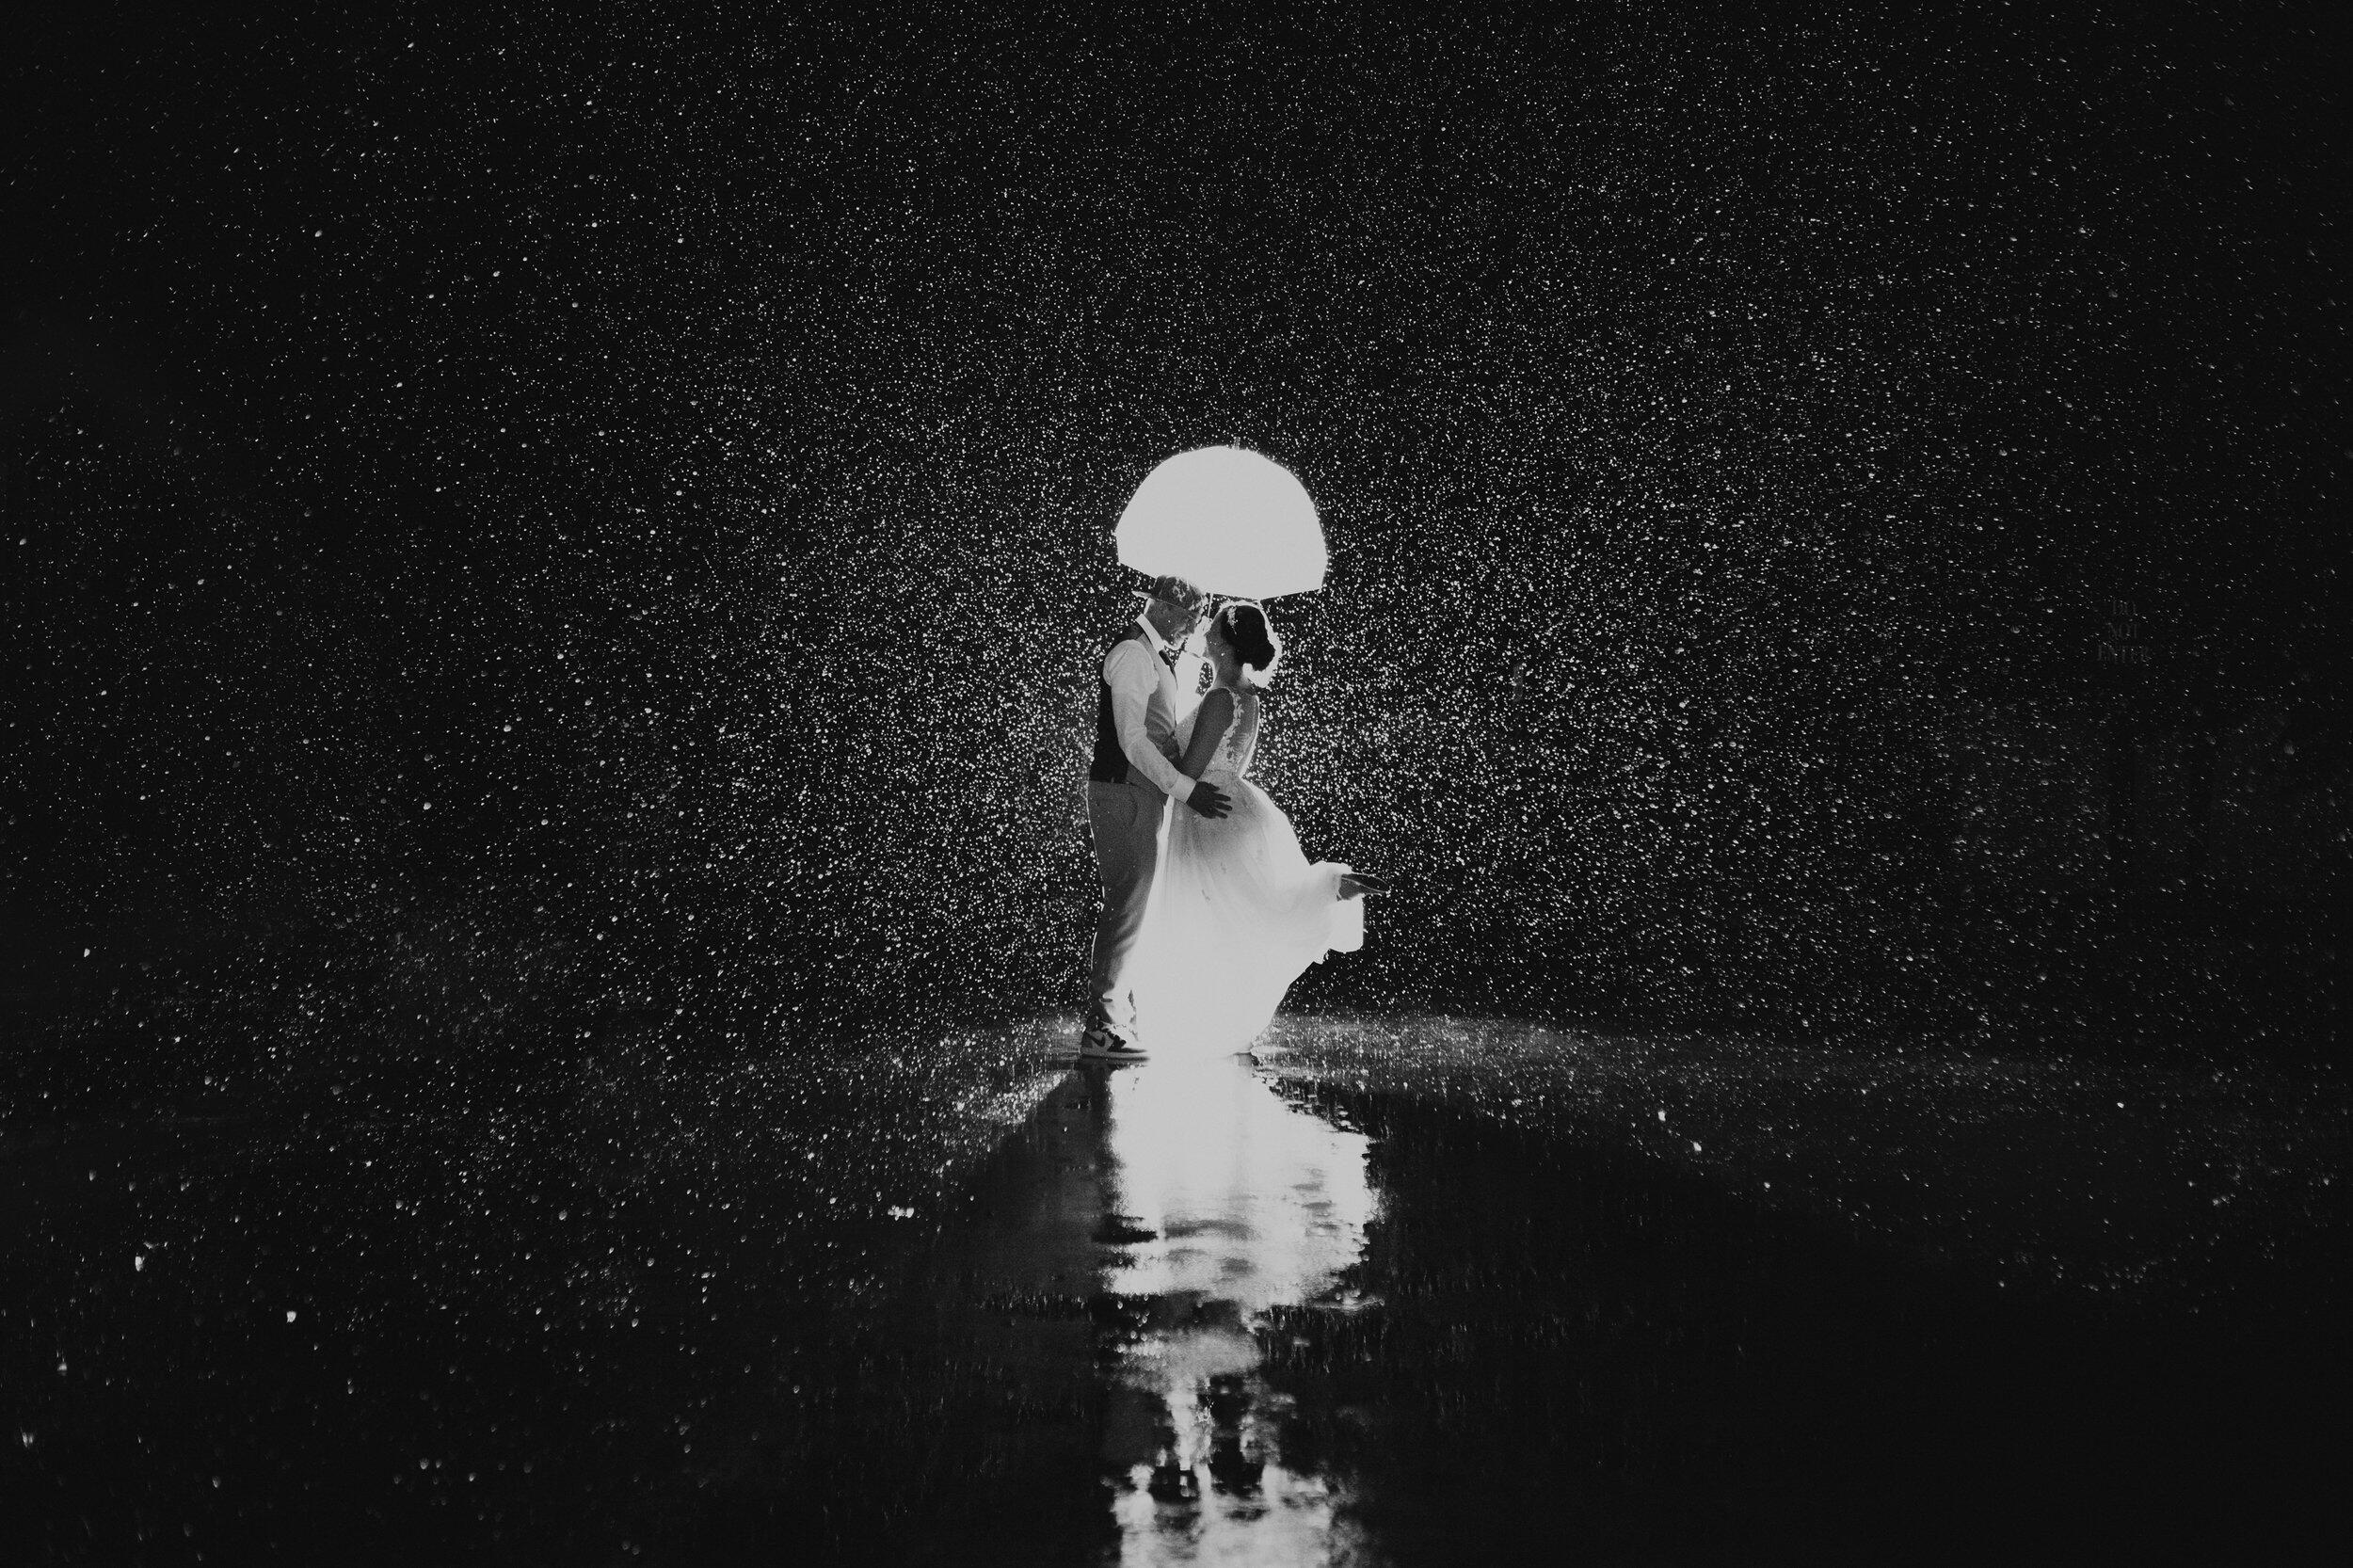 couple under an umbrella with rain all around them